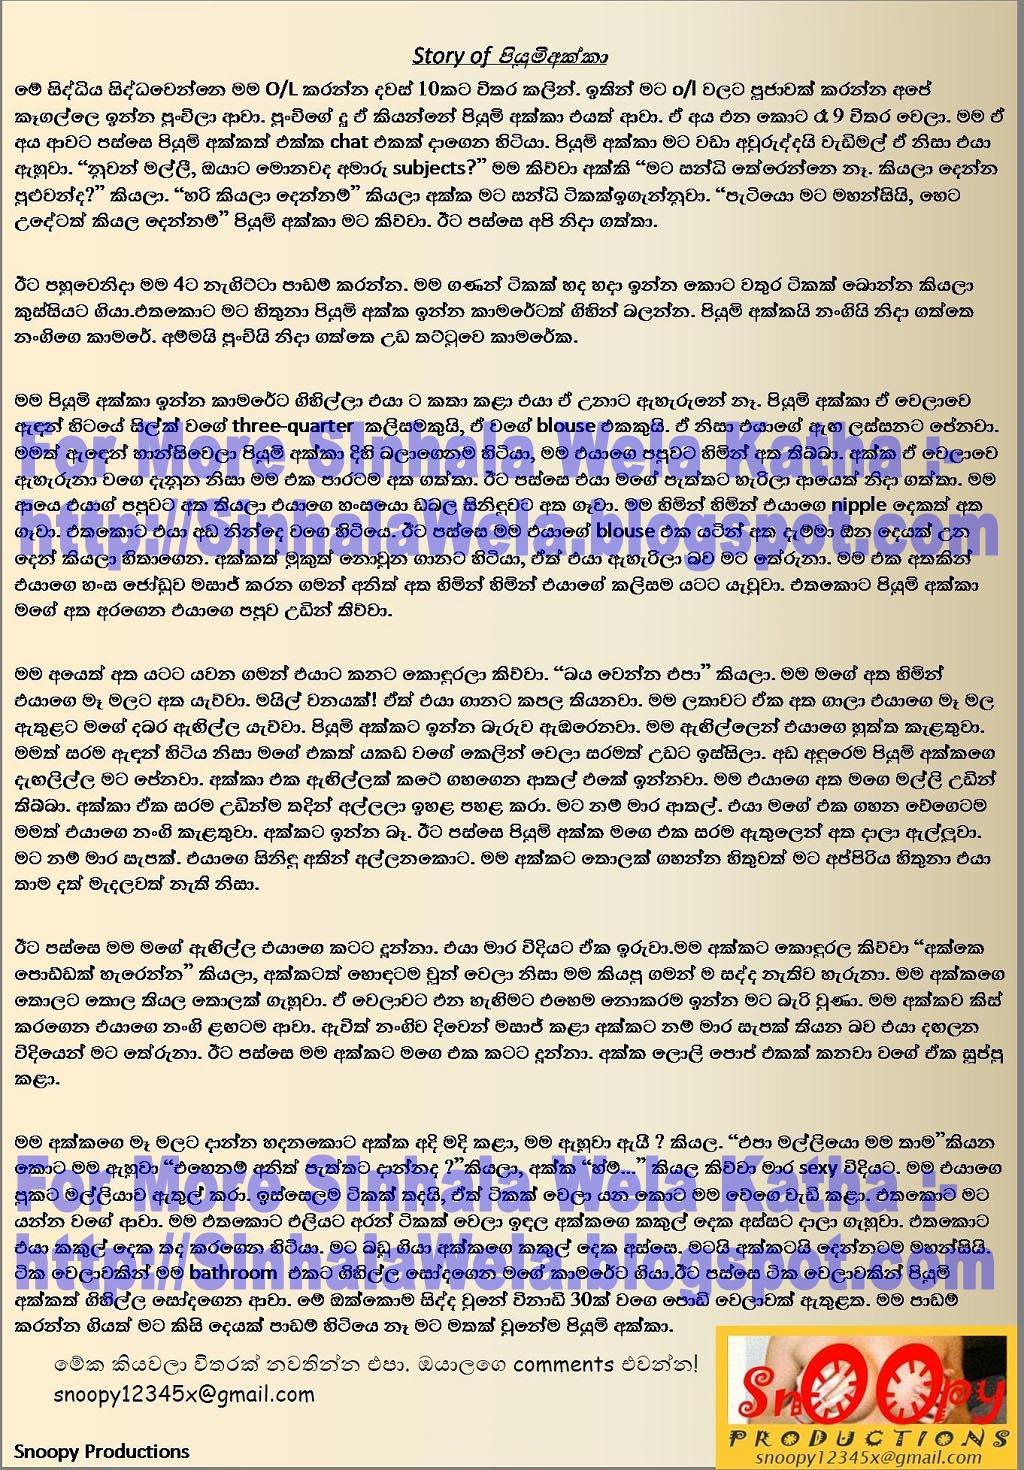 ... ://internationalrootssyndicate.com/wordpress36/sinhala-wal-katha-site